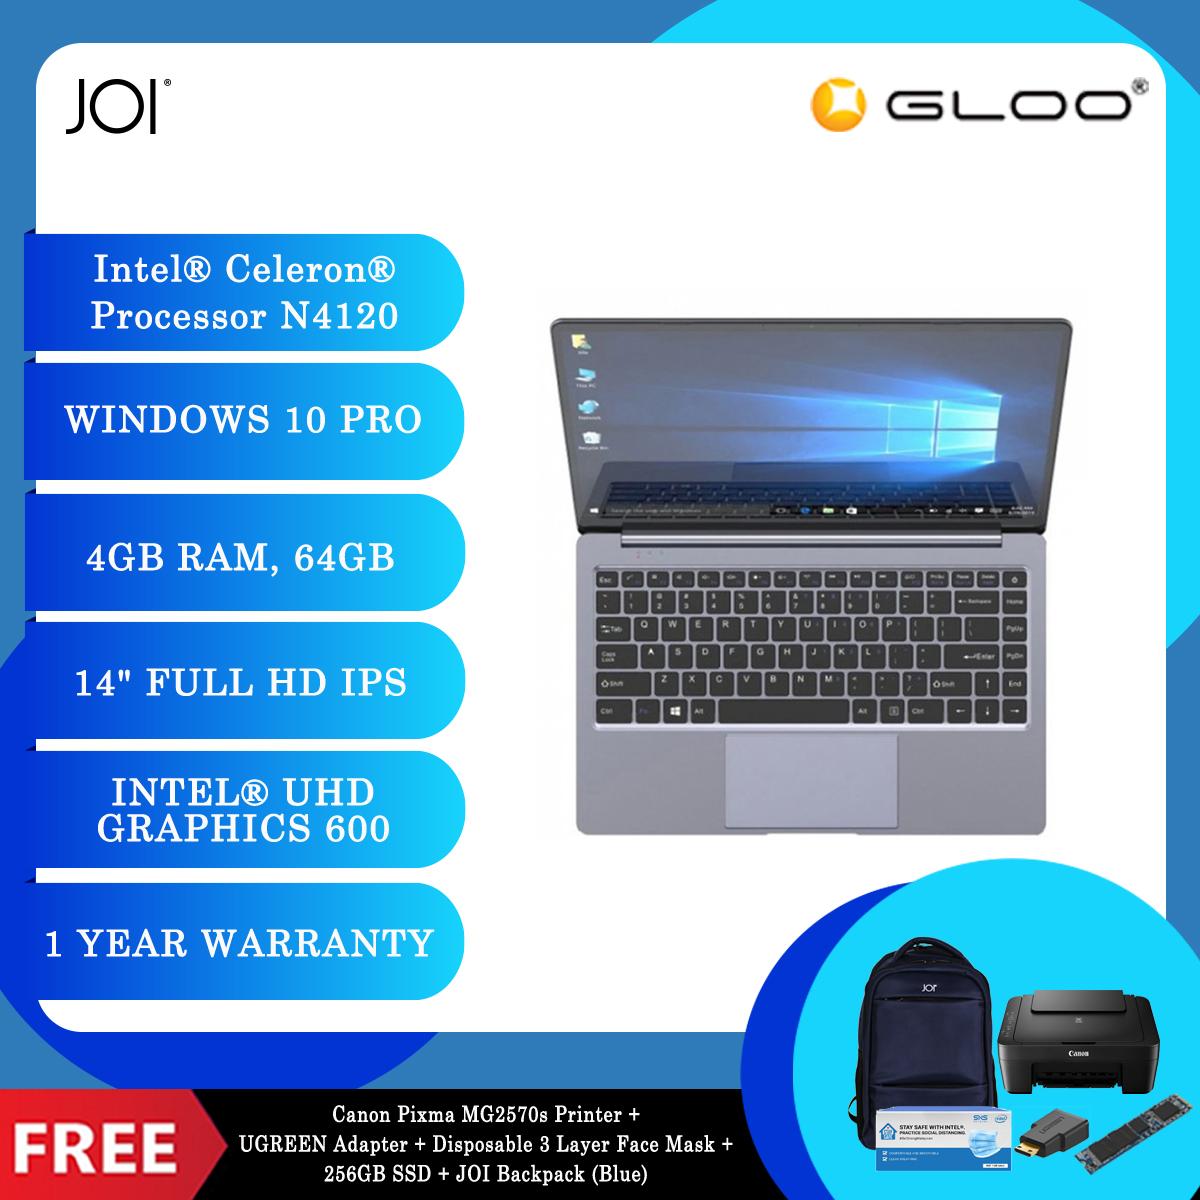 "JOI Book 155 Pro (N4120,4GB+64GB,14"" FHD,W10Pro) + Canon Pixma MG2570s Printer + UGREEN Mini HDMI Male To HDMI Female Adapter - 20101 + Disposable 3 Layer Face Mask 1 Box/50pcs + 256GB SSD + JOI Backpack (Blue) [BPPJOI0155PRBL]"